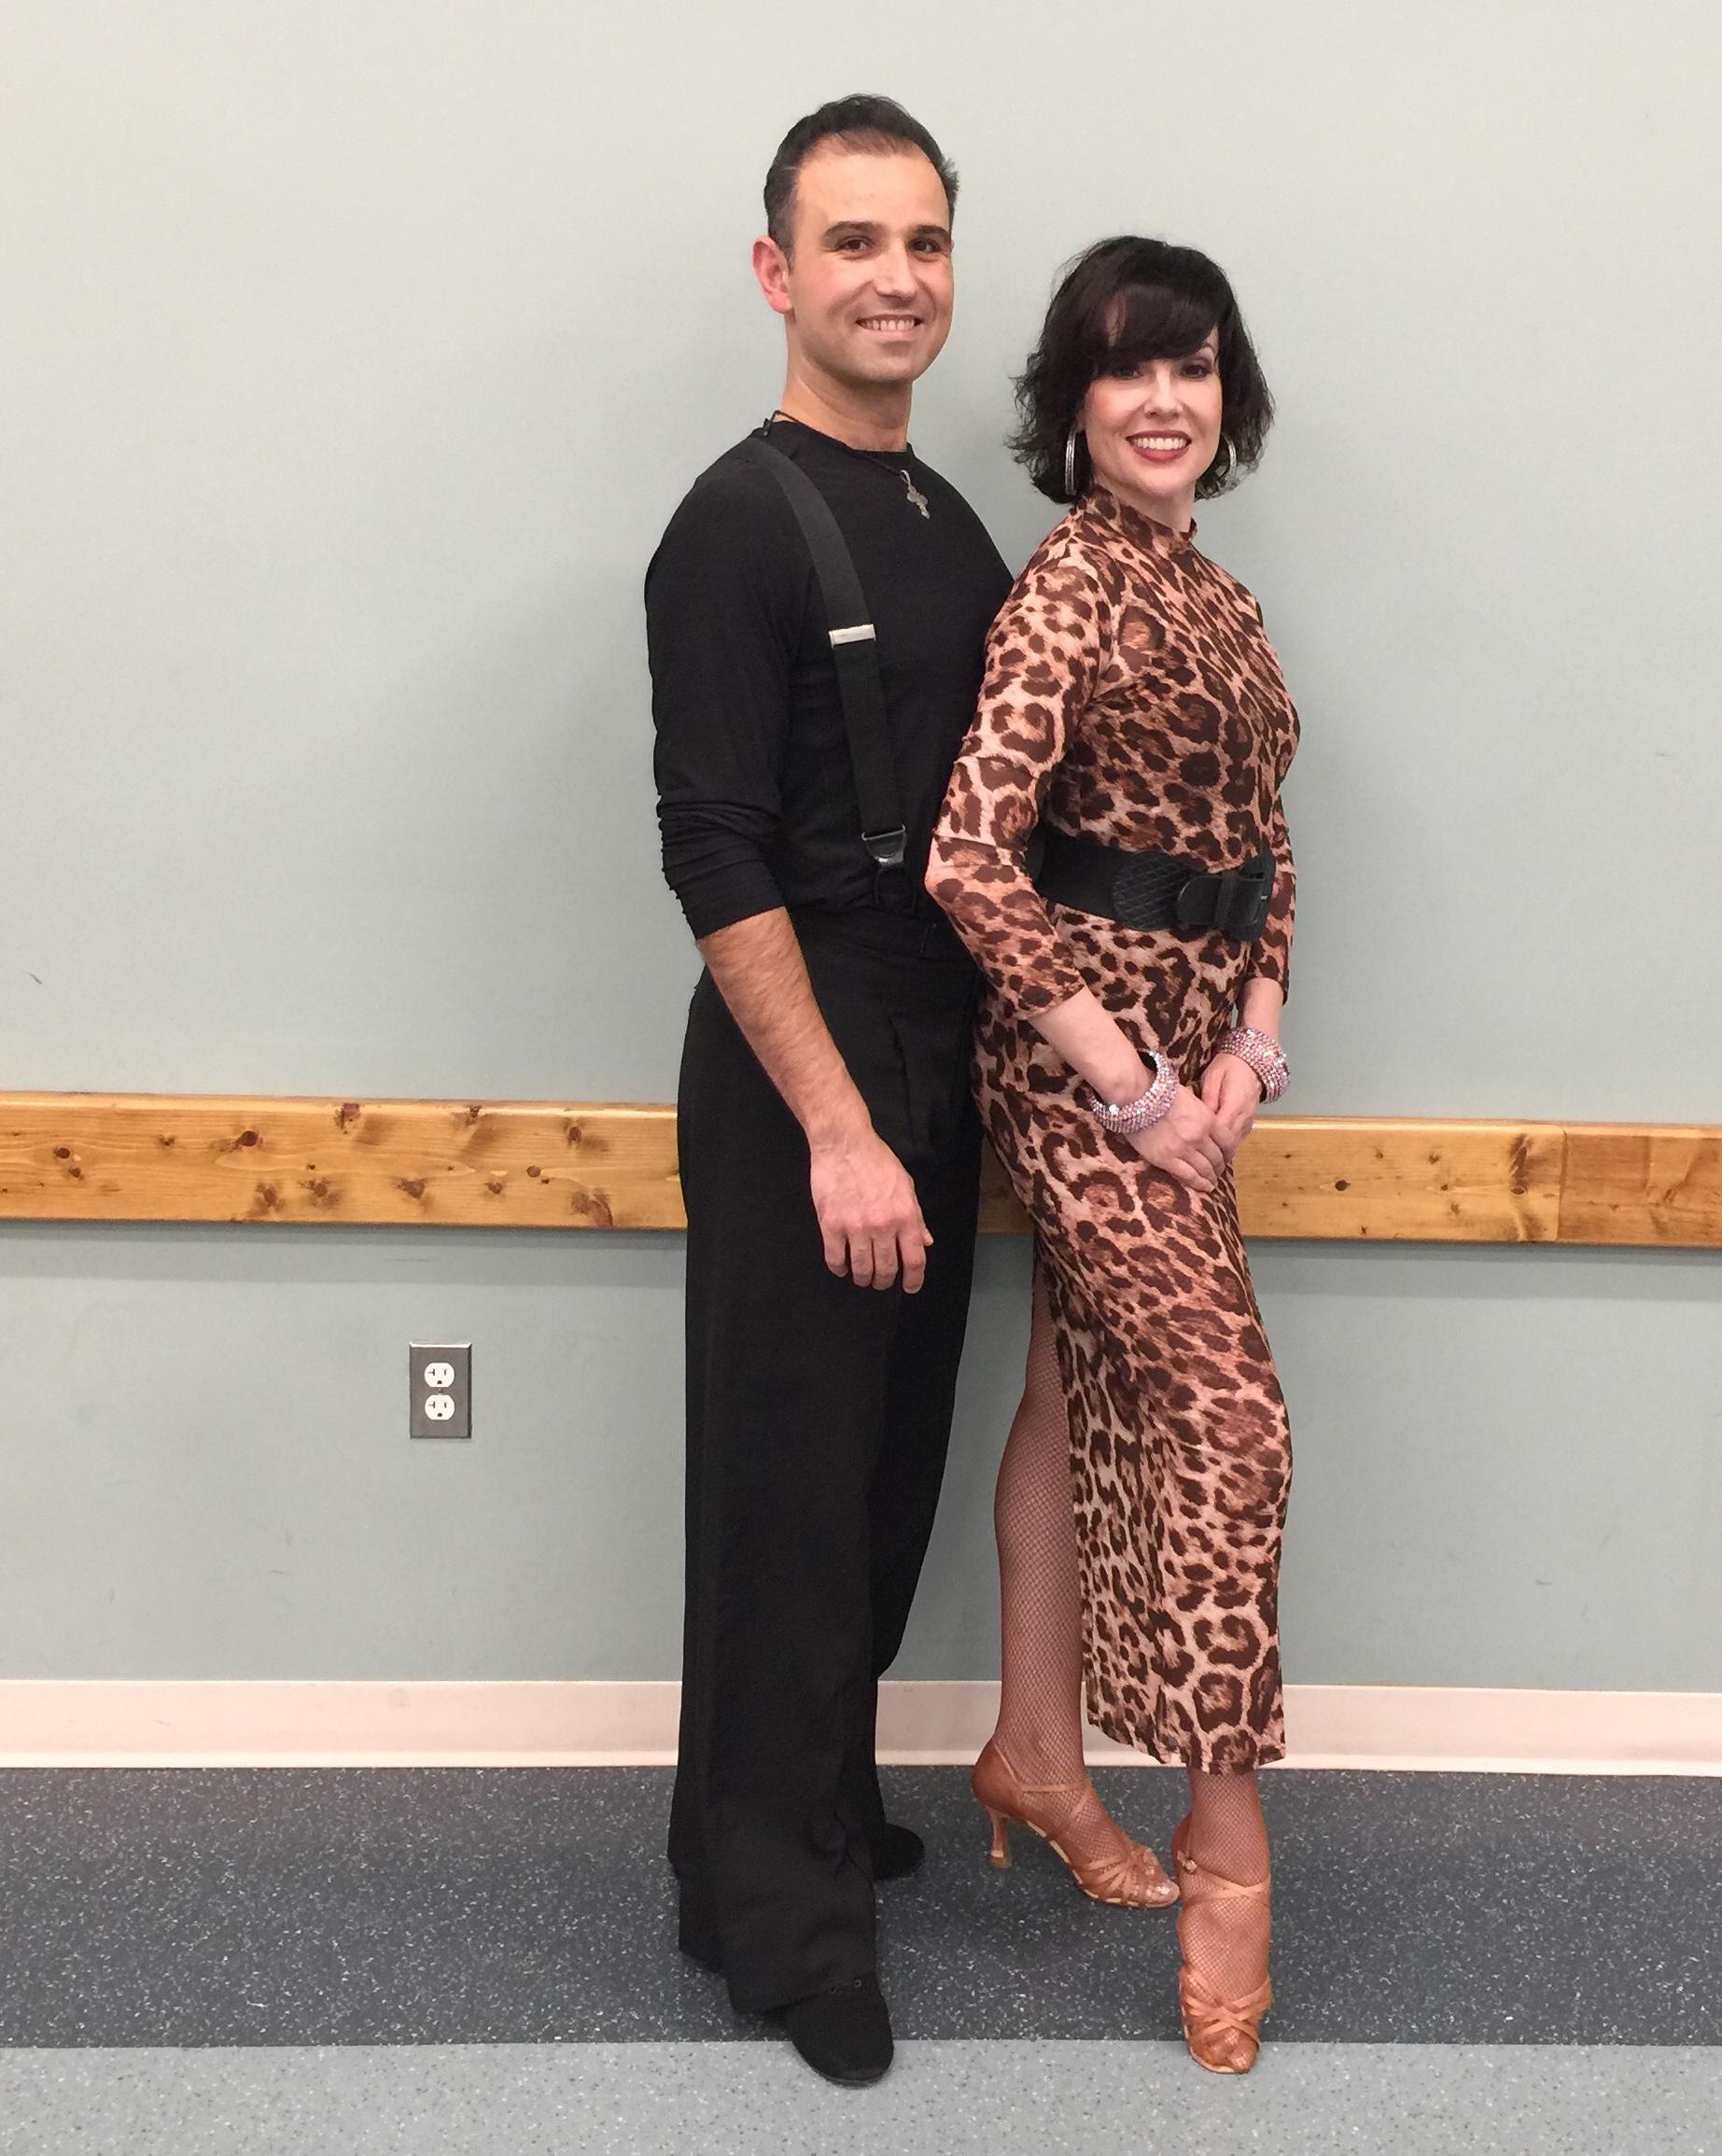 Tania Nunez & Dmitry Savchenko Performed Latin Dances At DanceInTime's Hispanic Heritage Month Shows